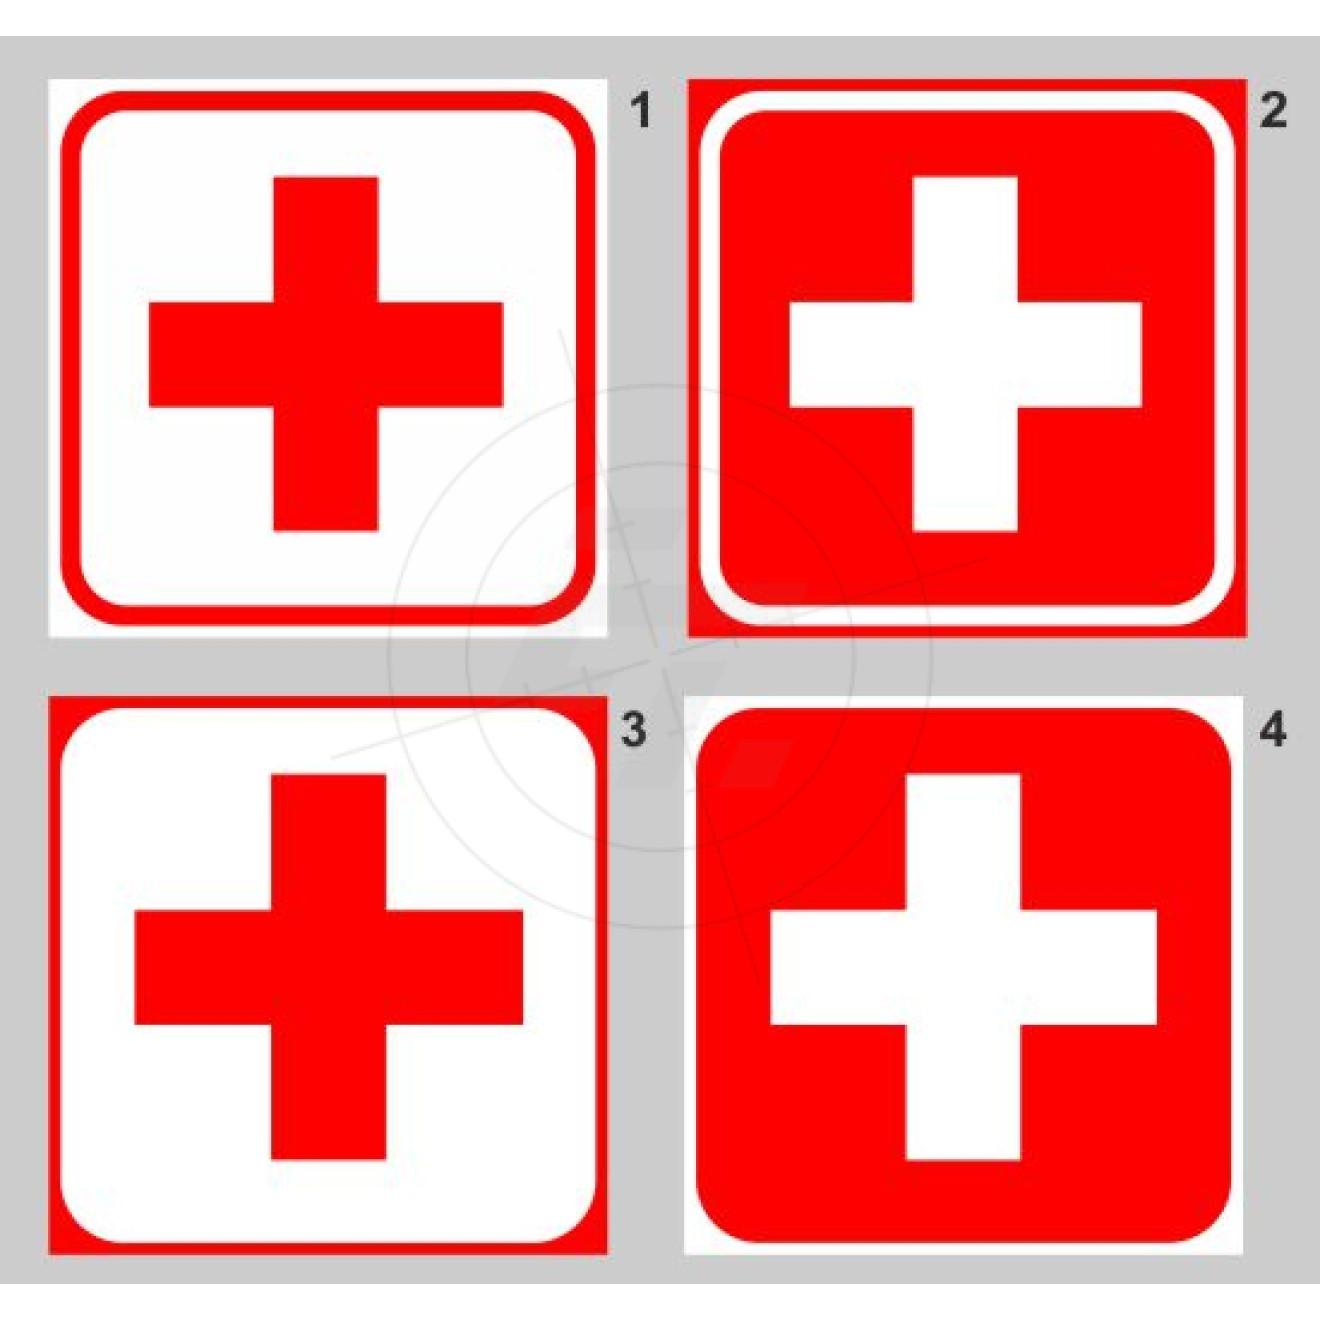 Deutsches Rotes Kreuz, DRK | {Rotes kreuz symbol 9}